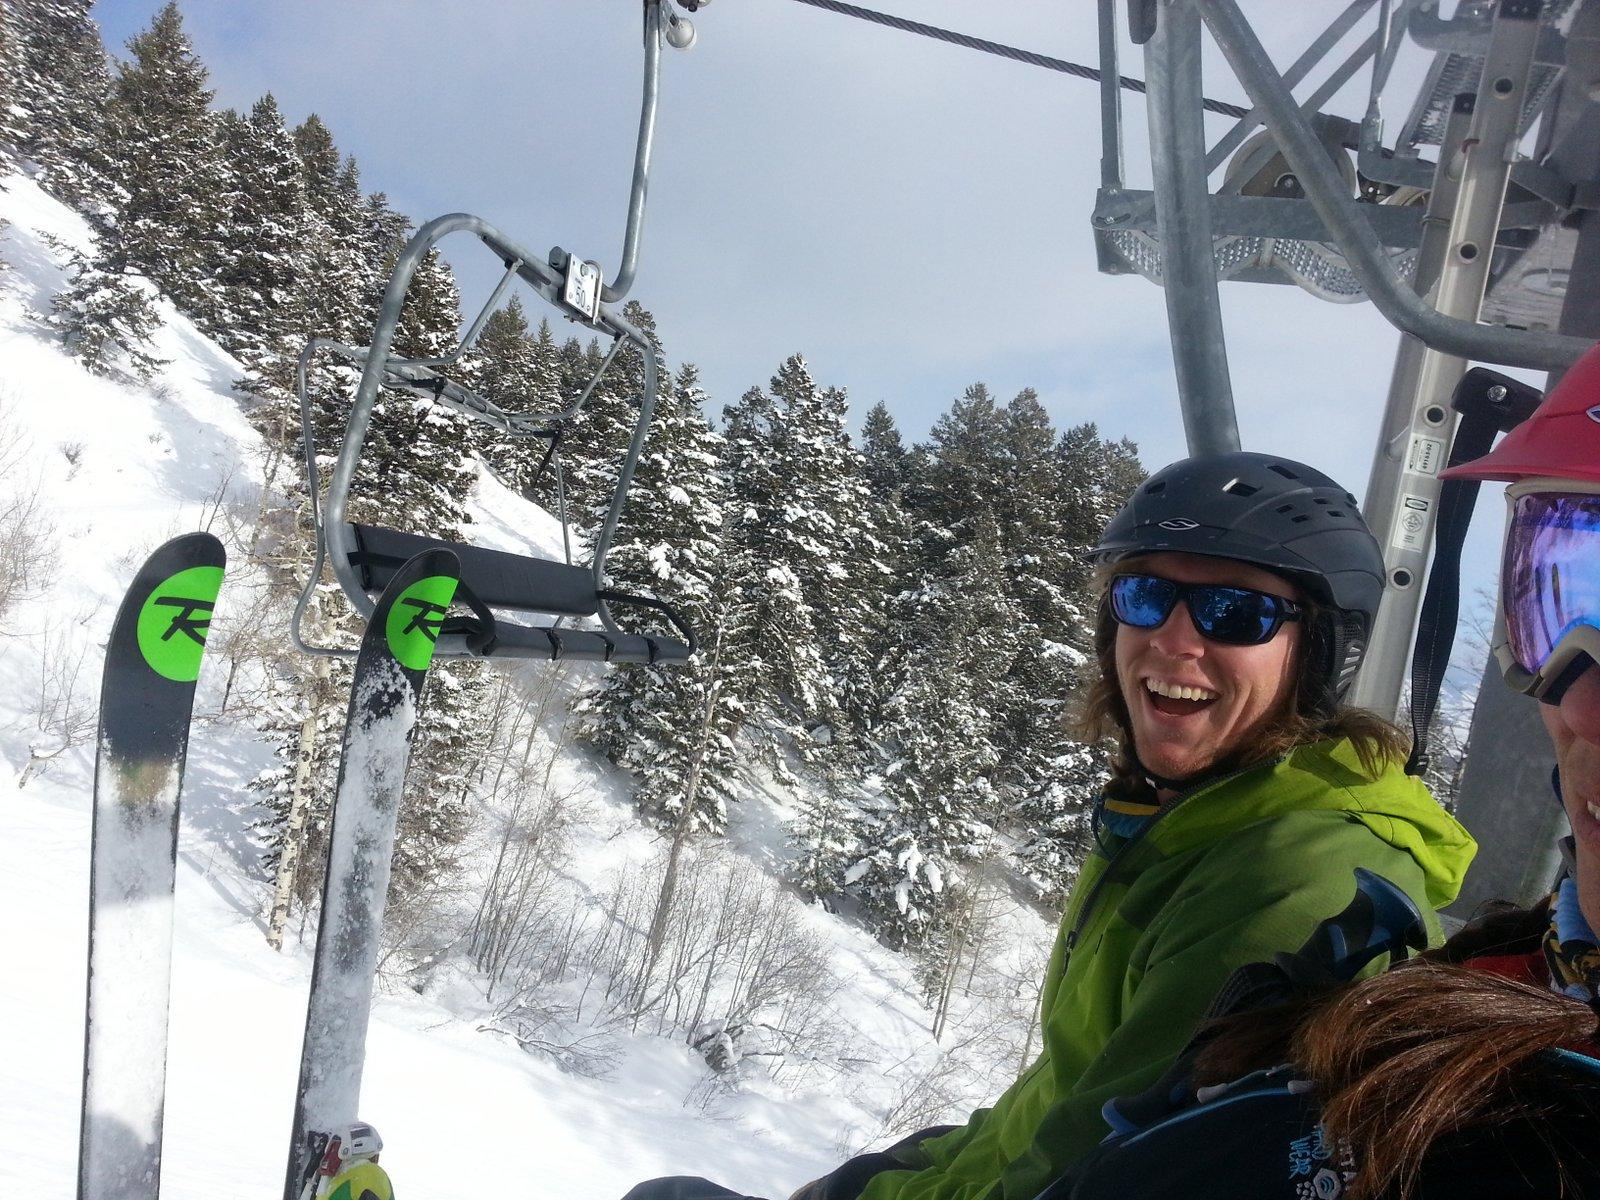 Matt with skis